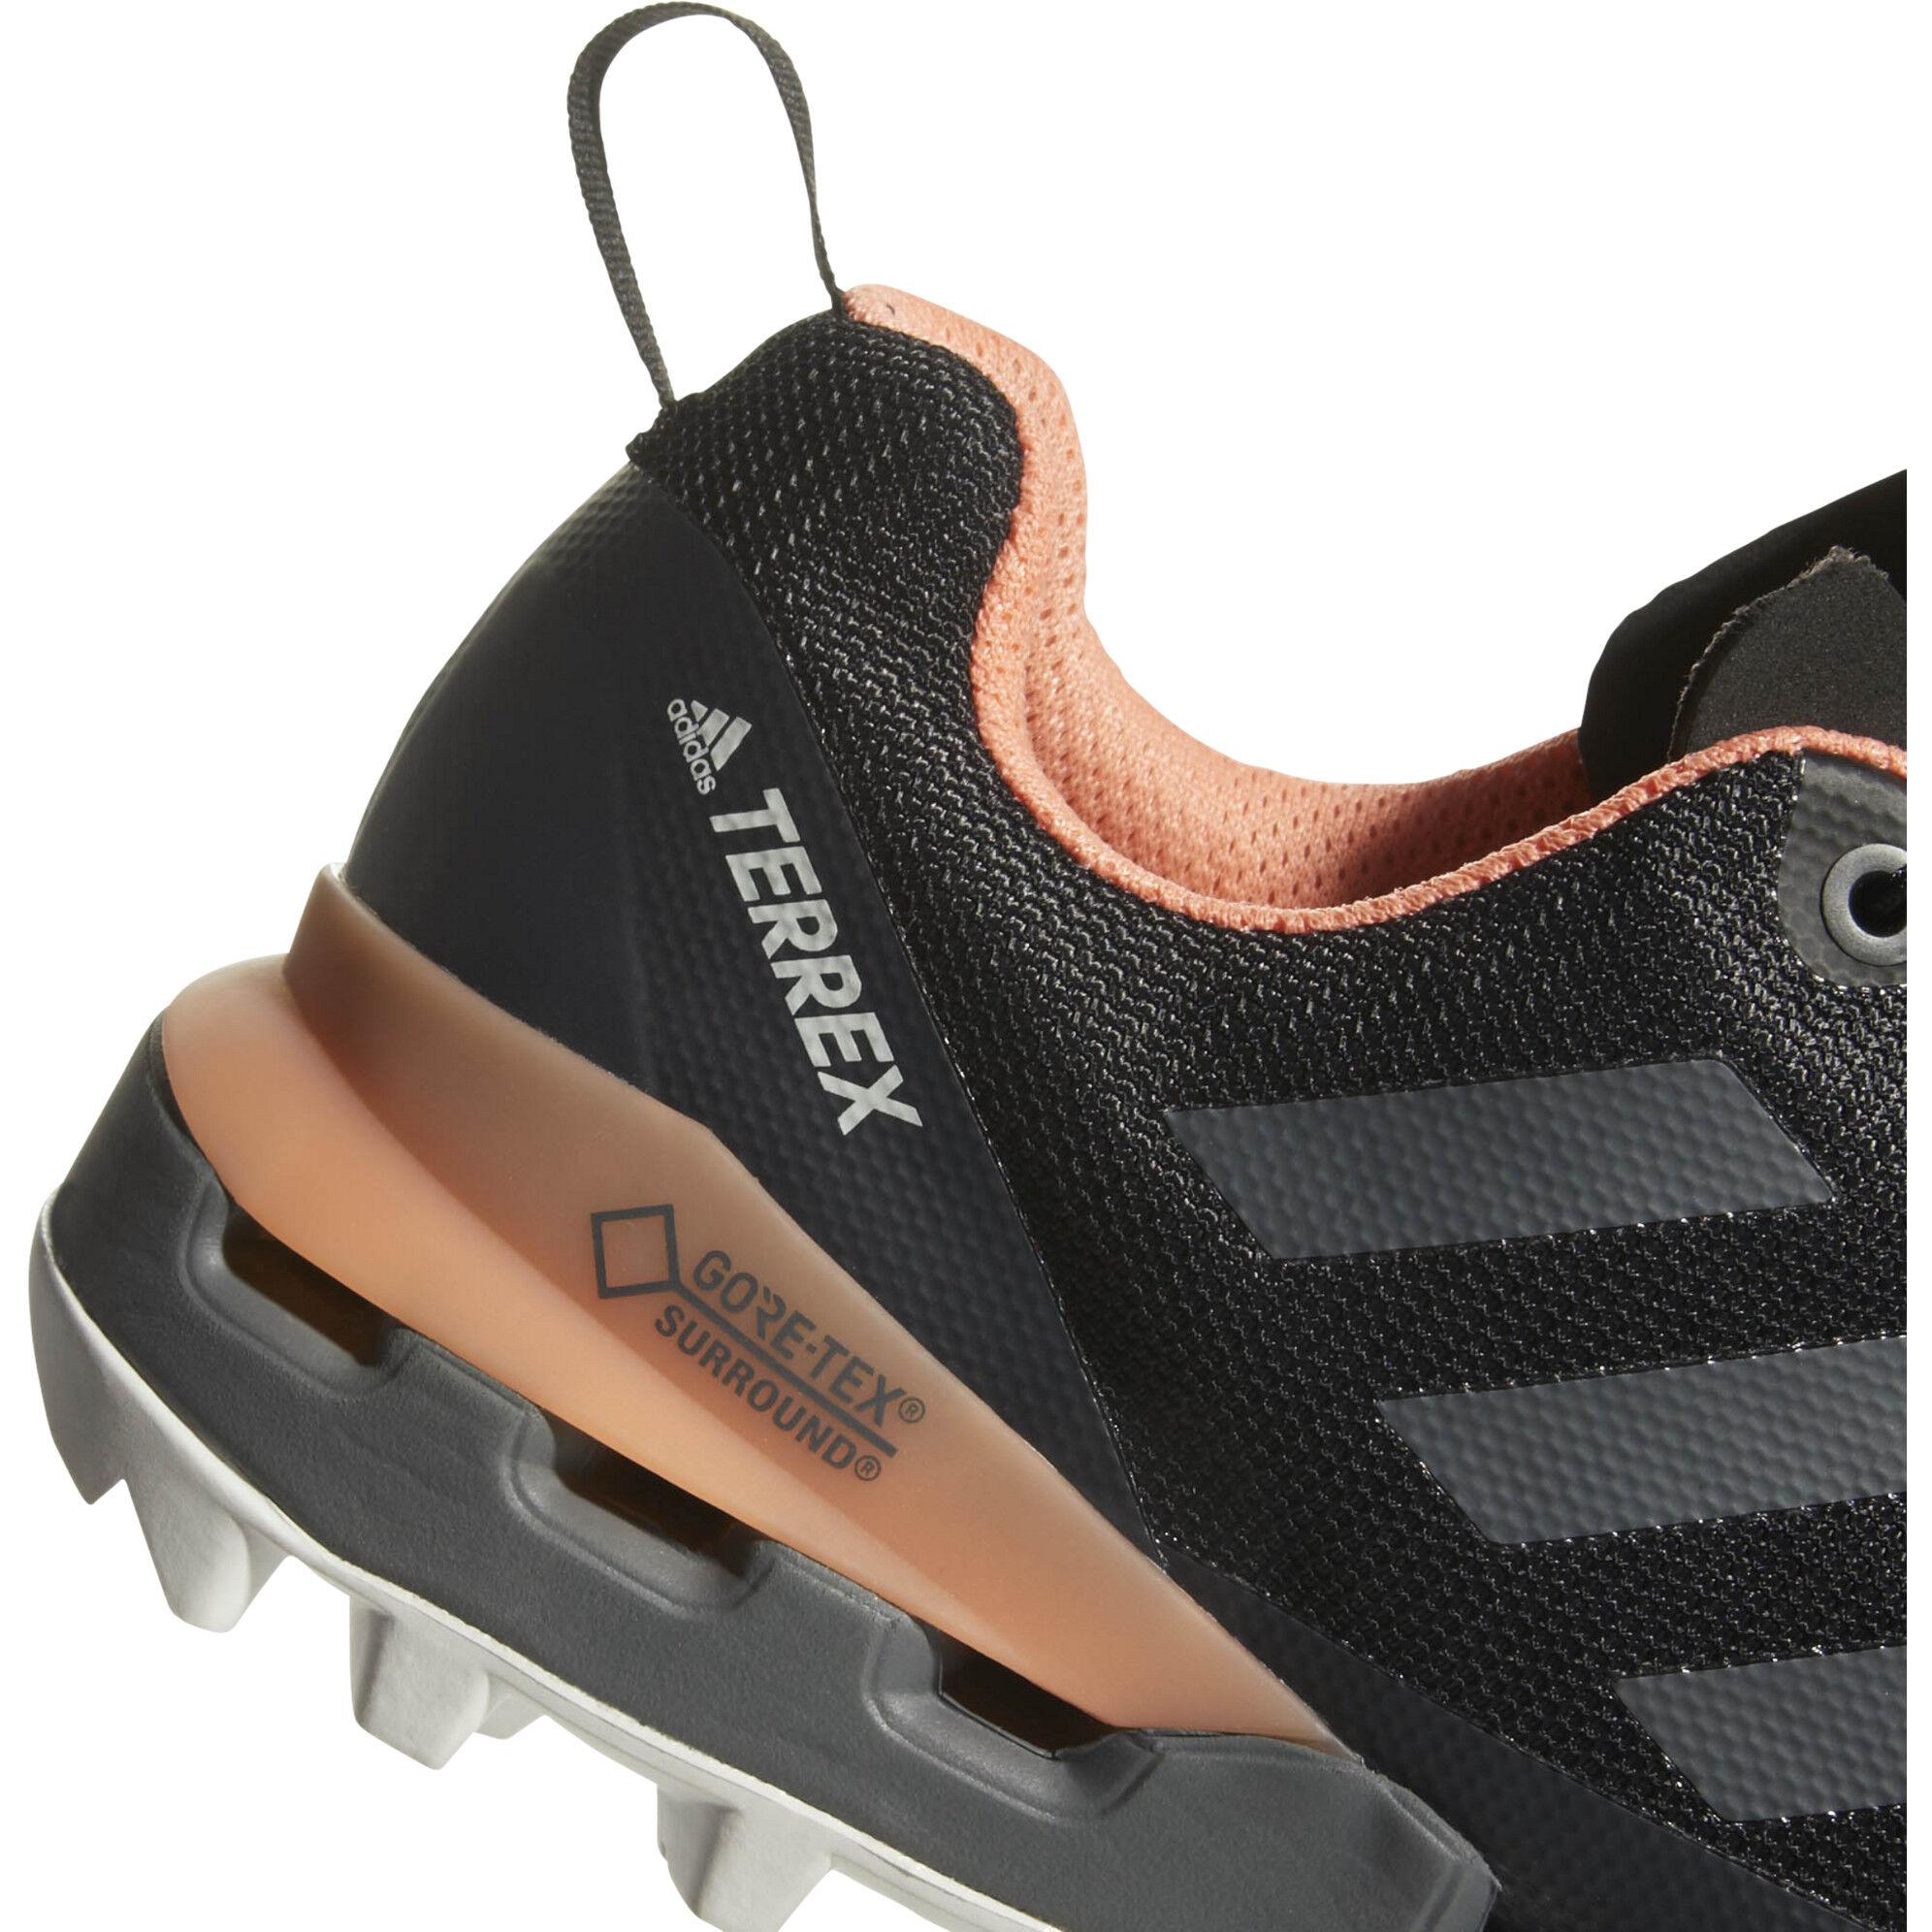 adidas TERREX Fast GTX Surround Shoes Damen core blackgrey fivechalk coral